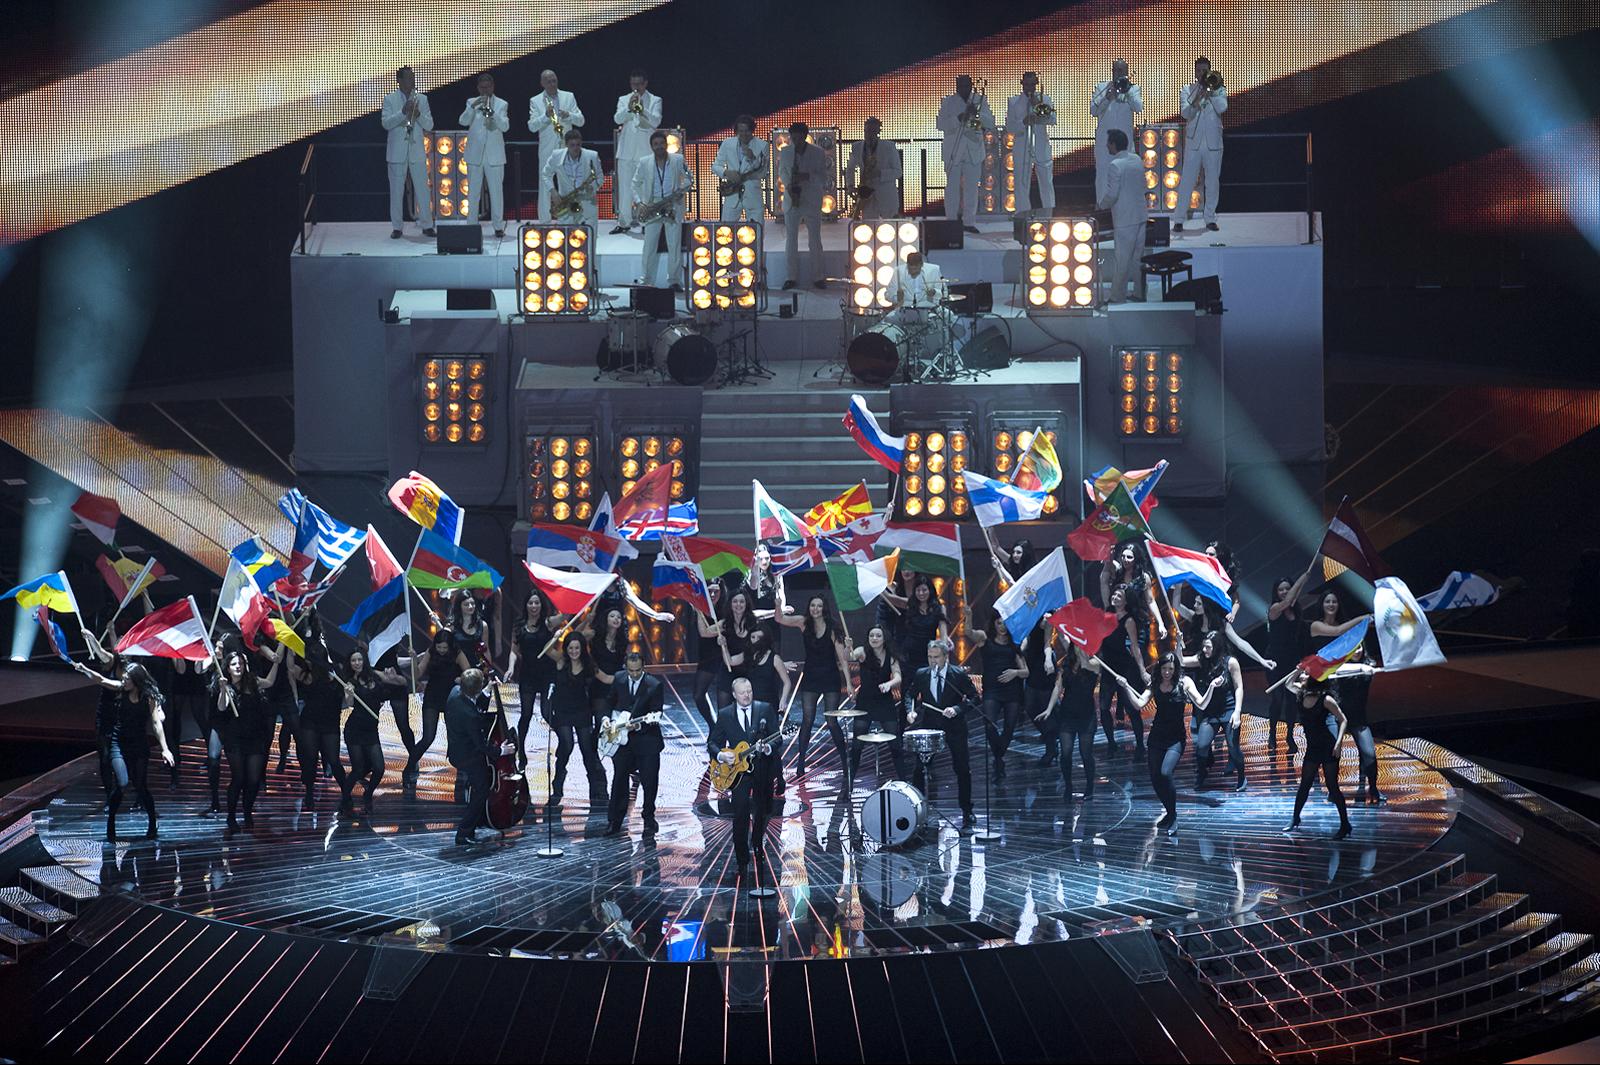 Opening Eurovision act in Düsseldorf in 2011